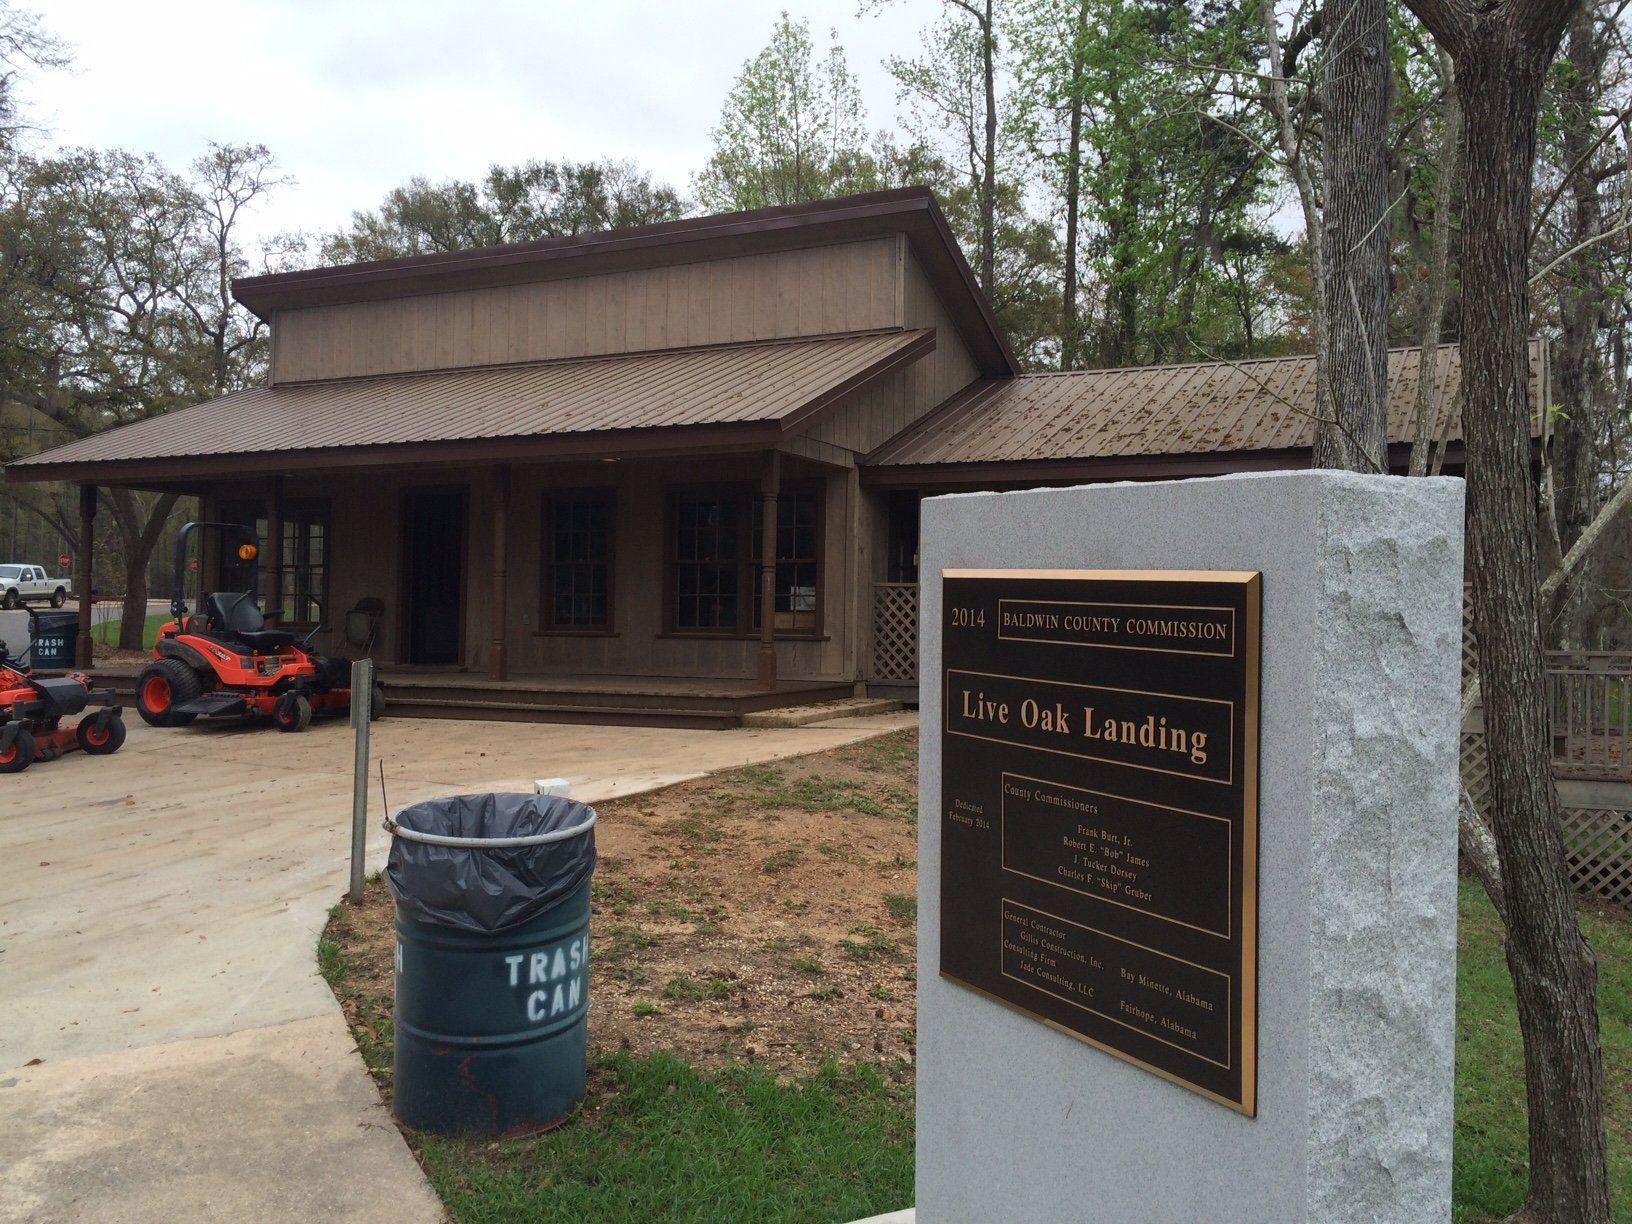 Alabama baldwin county stockton - North Baldwin Chamber Of Commerce Serving The Communities Of North Baldwin County In South Alabama